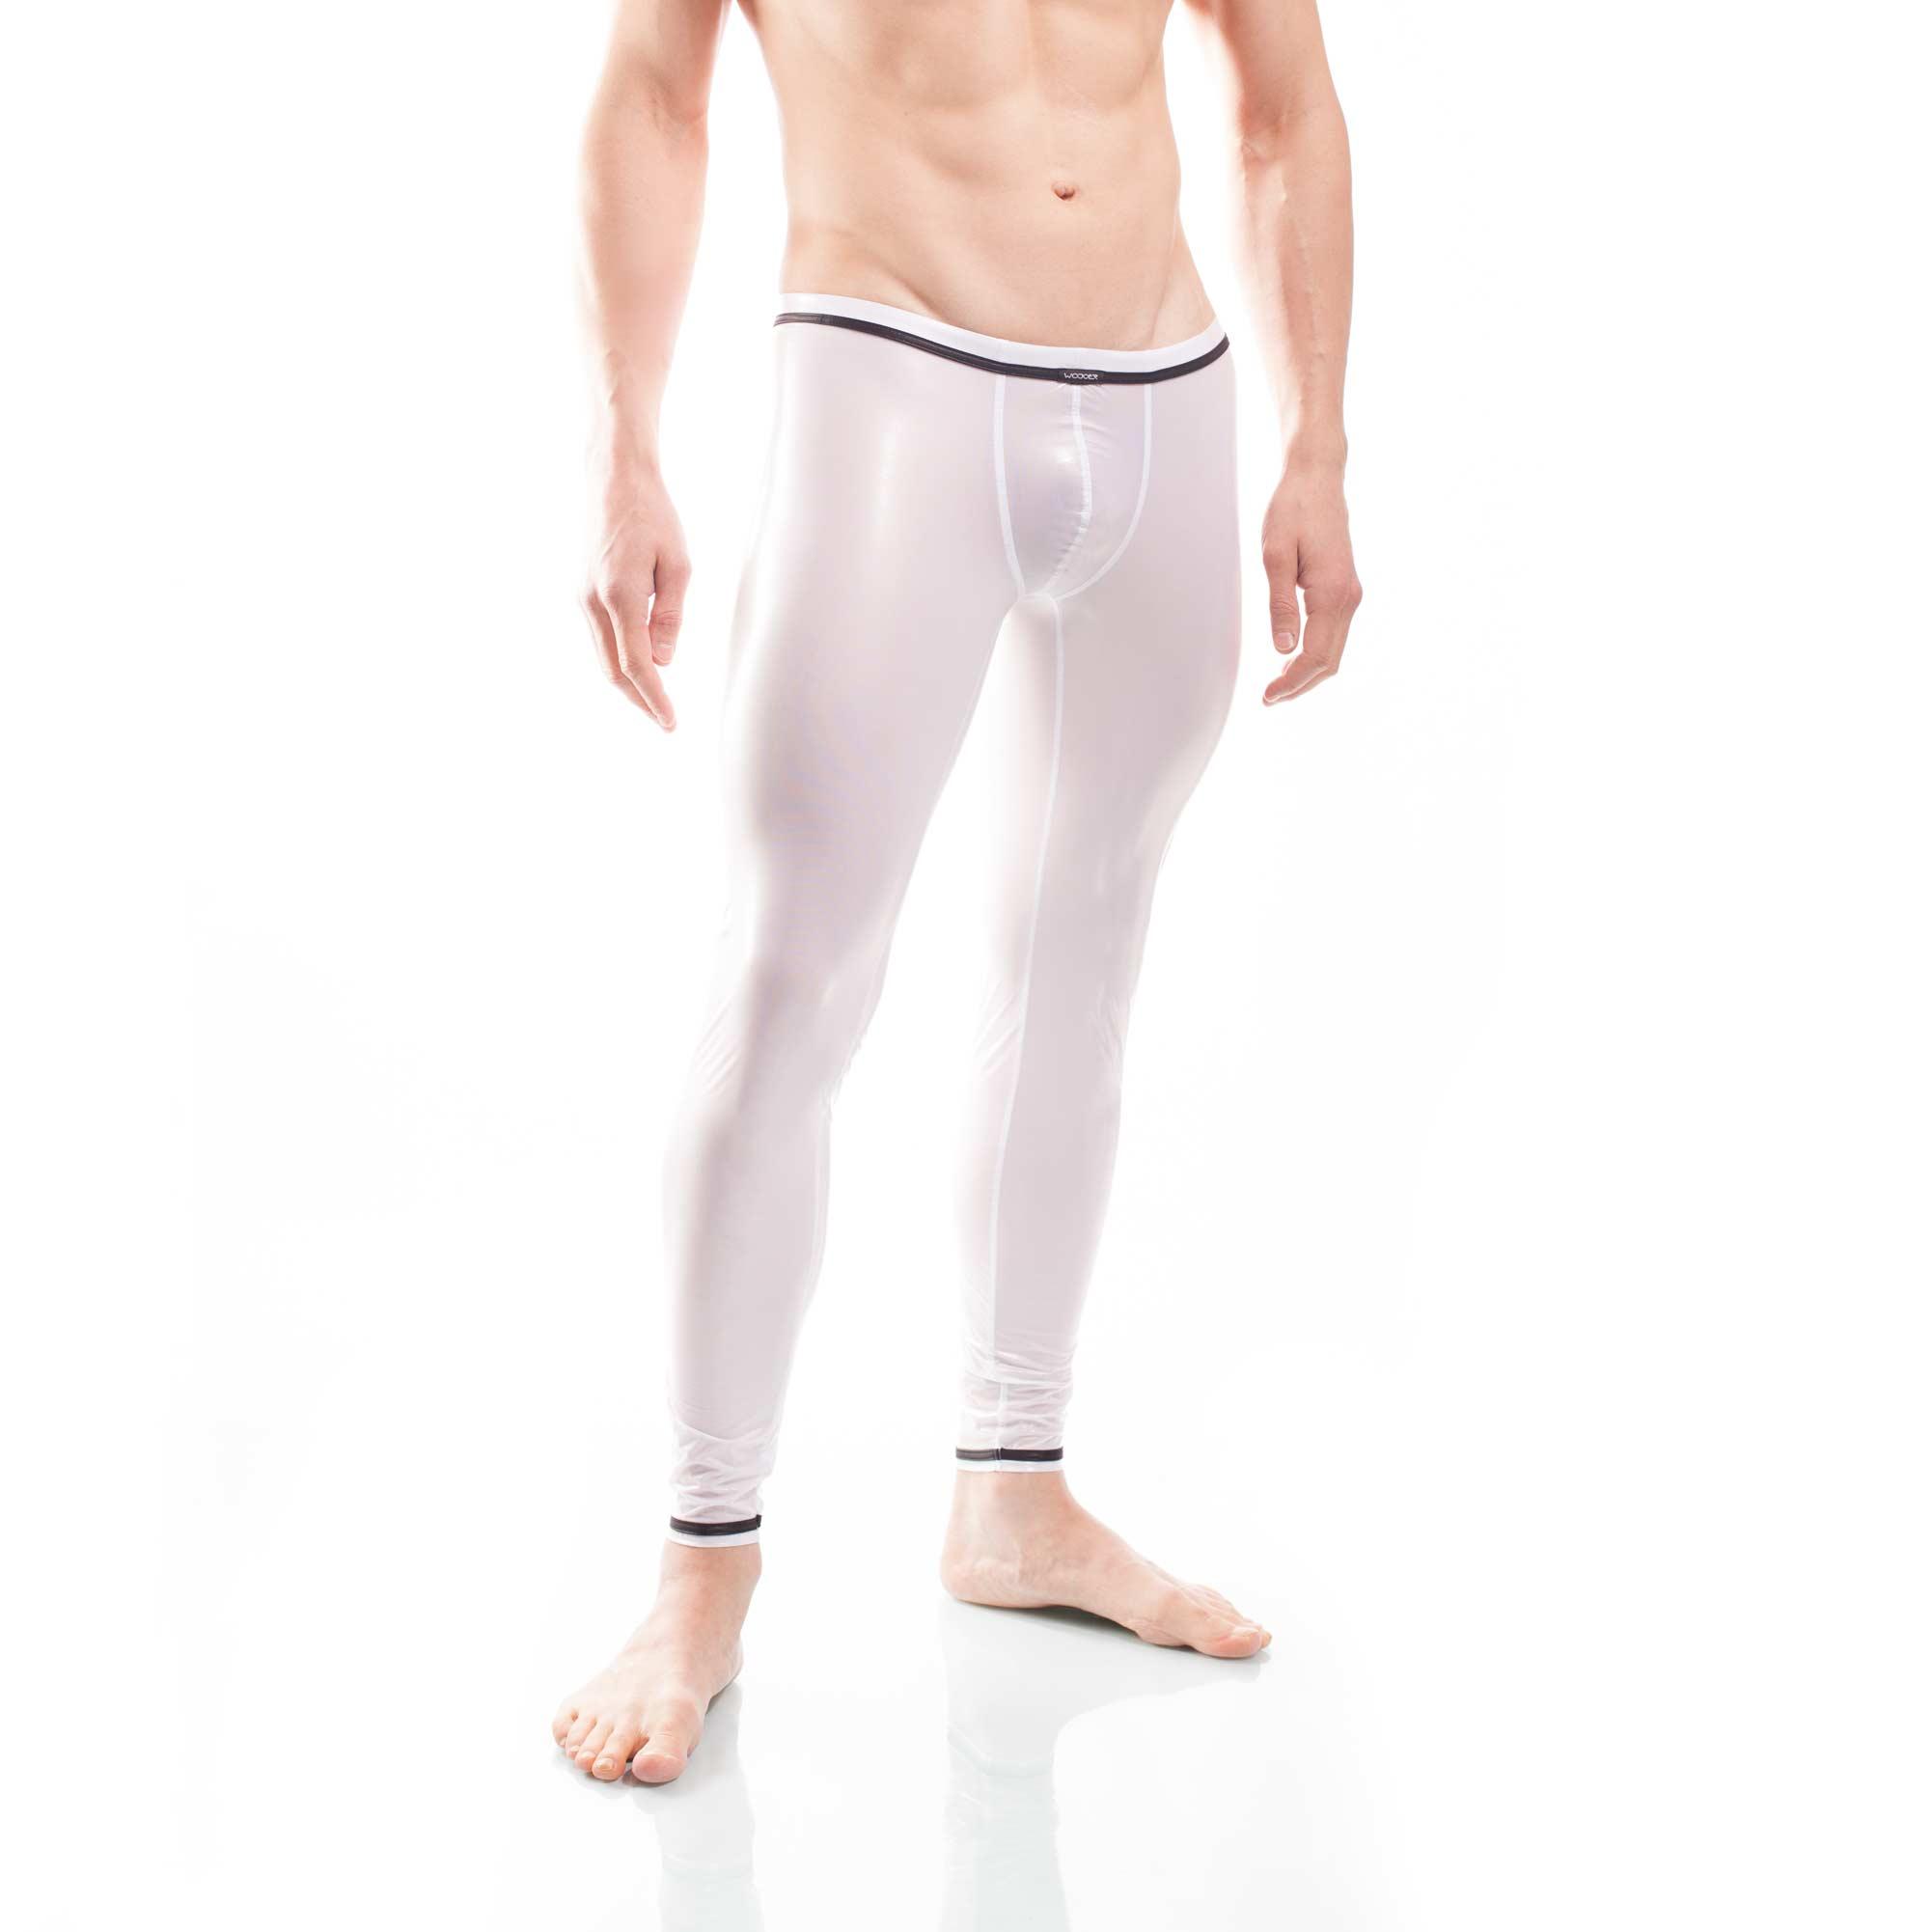 synthetische Latex Pants, synthetischer rubber, weiße wasserdichte Netz-Gummi Leggings